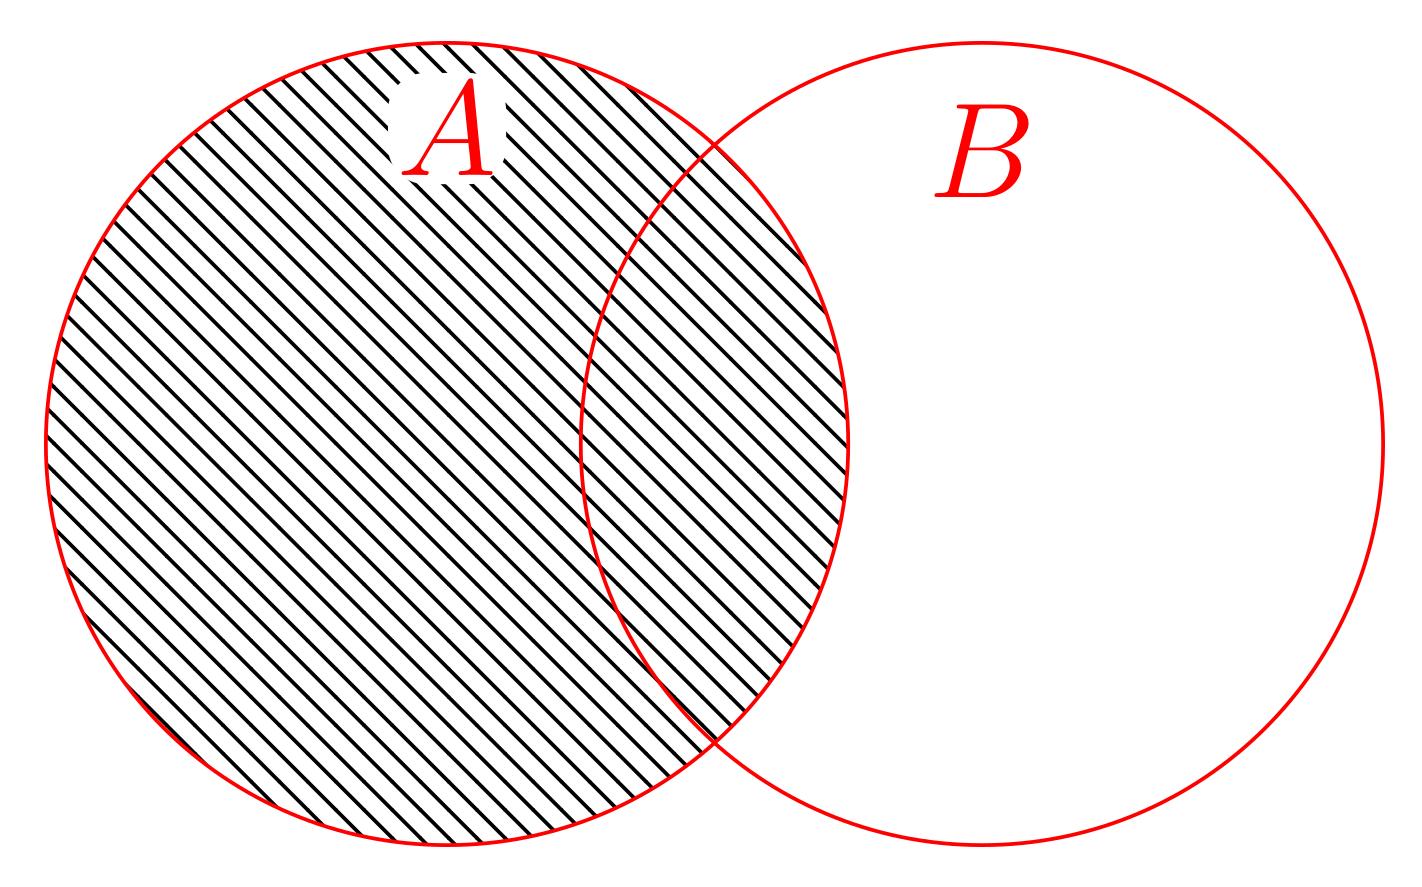 Venn Diagrams And Patterns